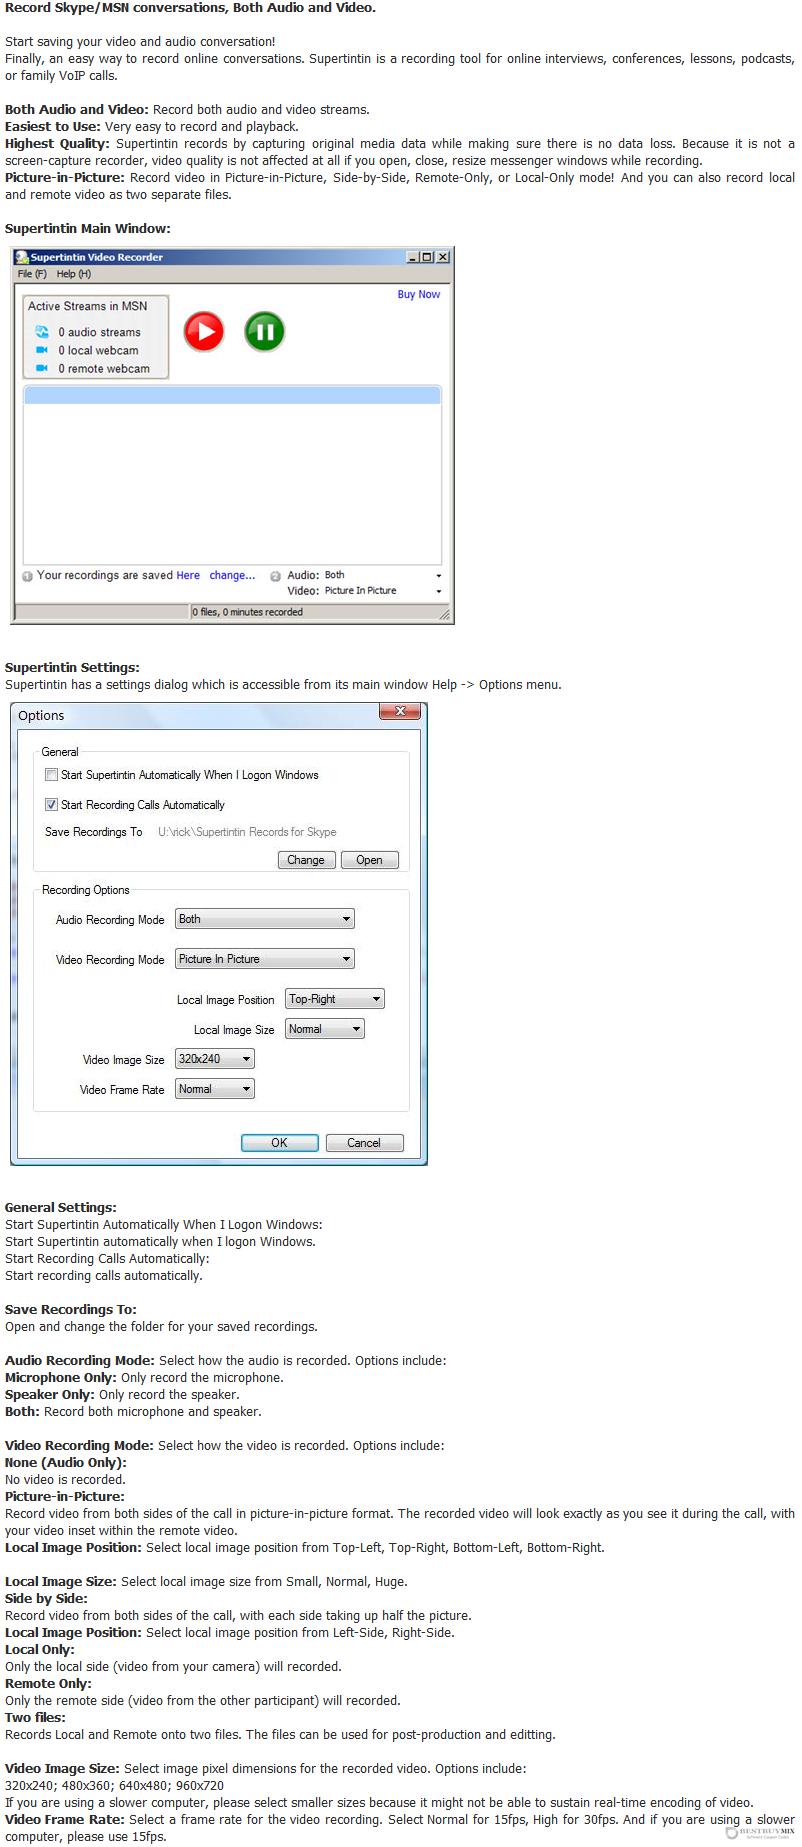 Supertintin MSN Webcam Recorder Discount Coupon Code